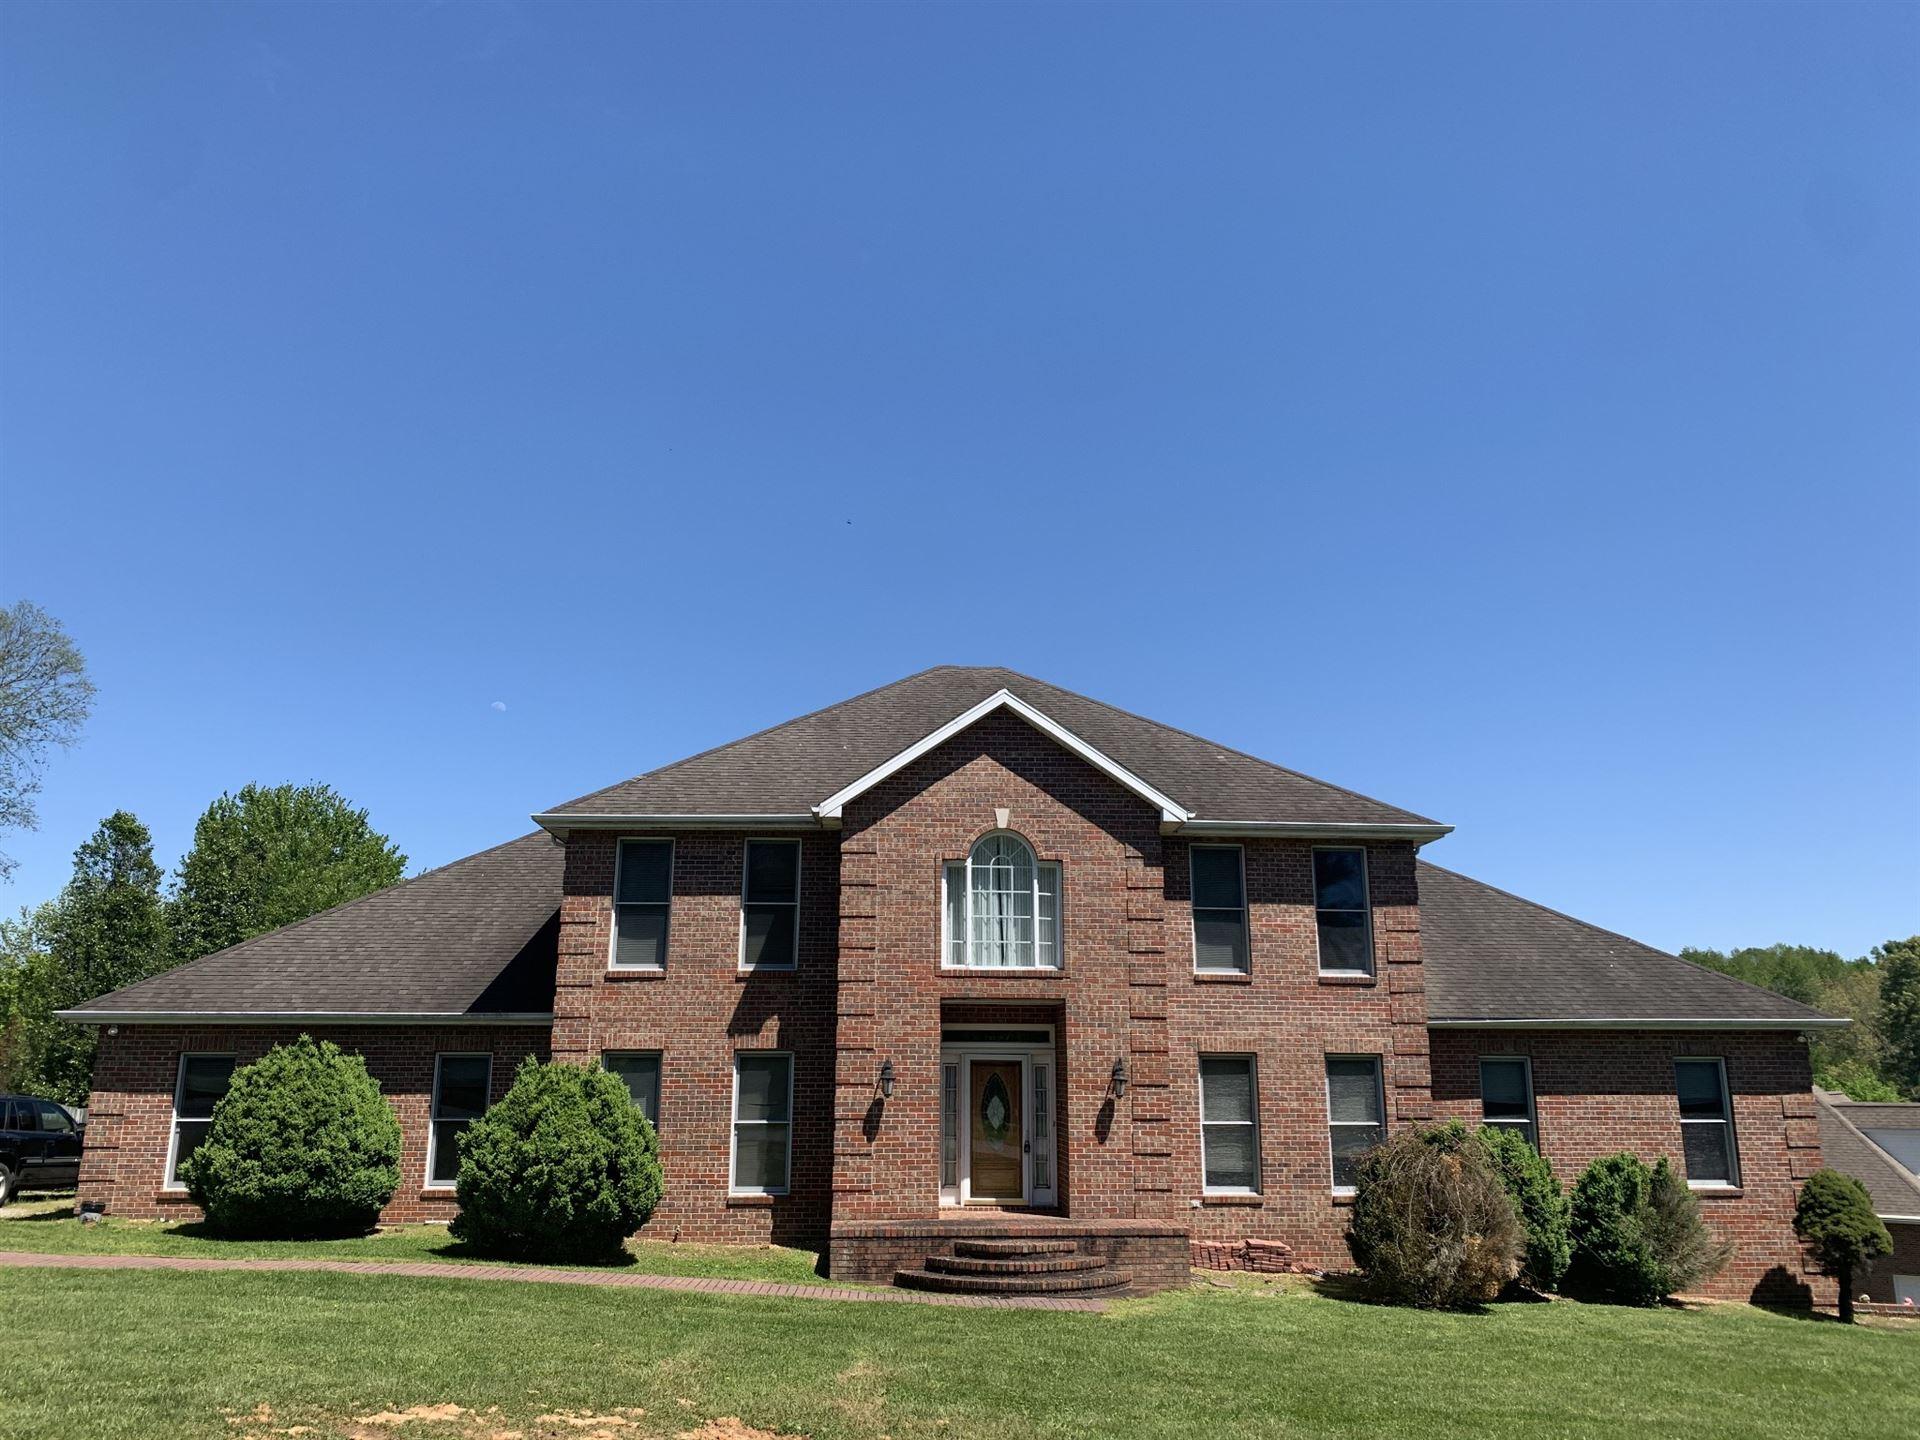 529 Pleasant Hill Dr, Cookeville, TN 38501 - MLS#: 2147437